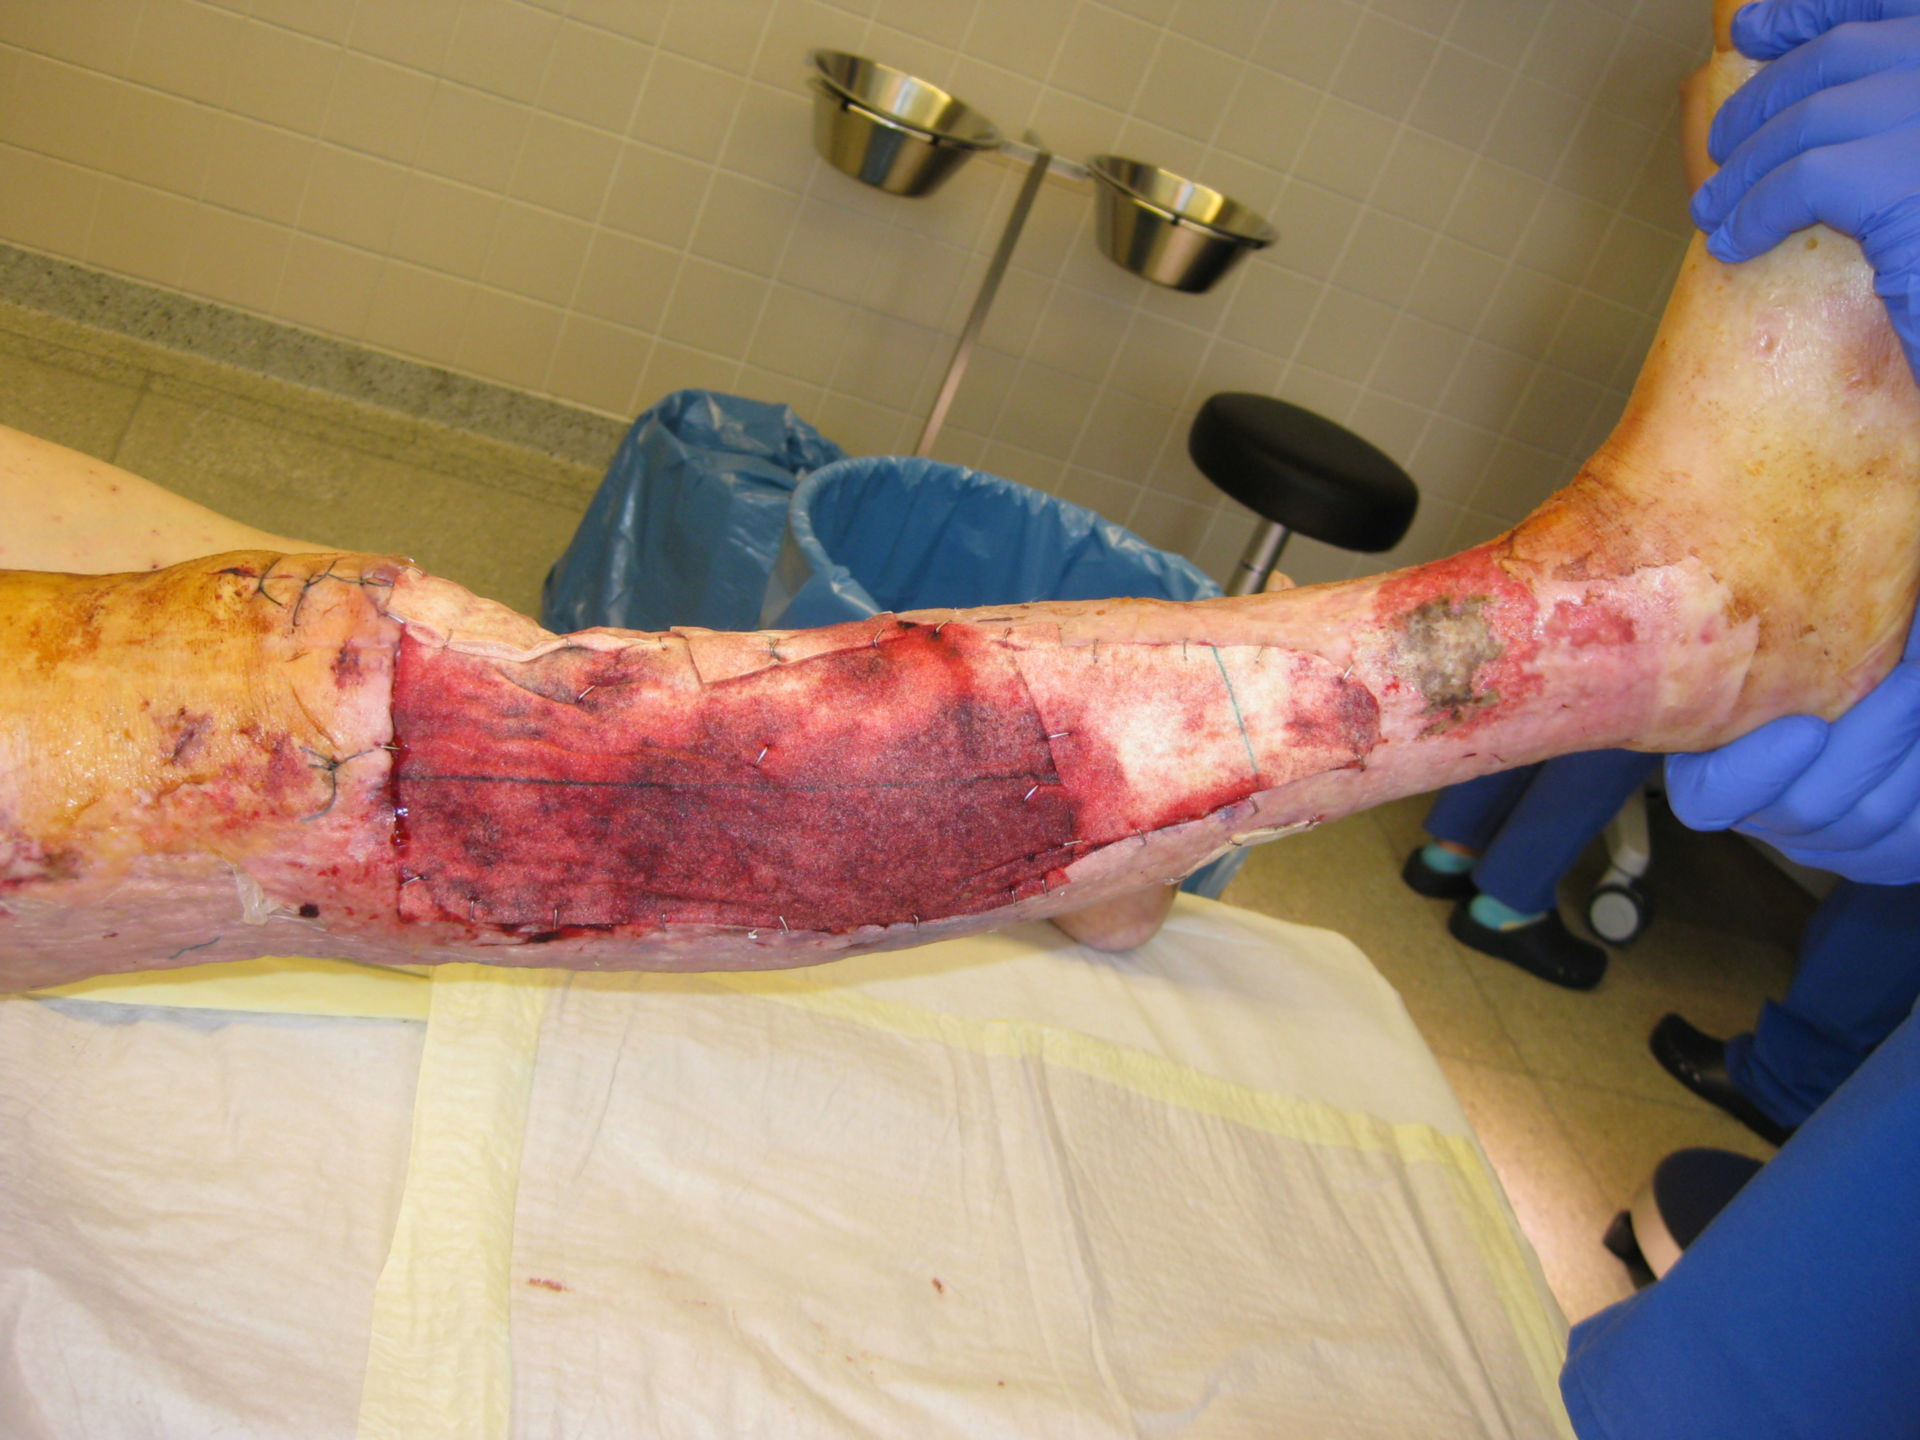 Gangrenous pyoderma, right leg